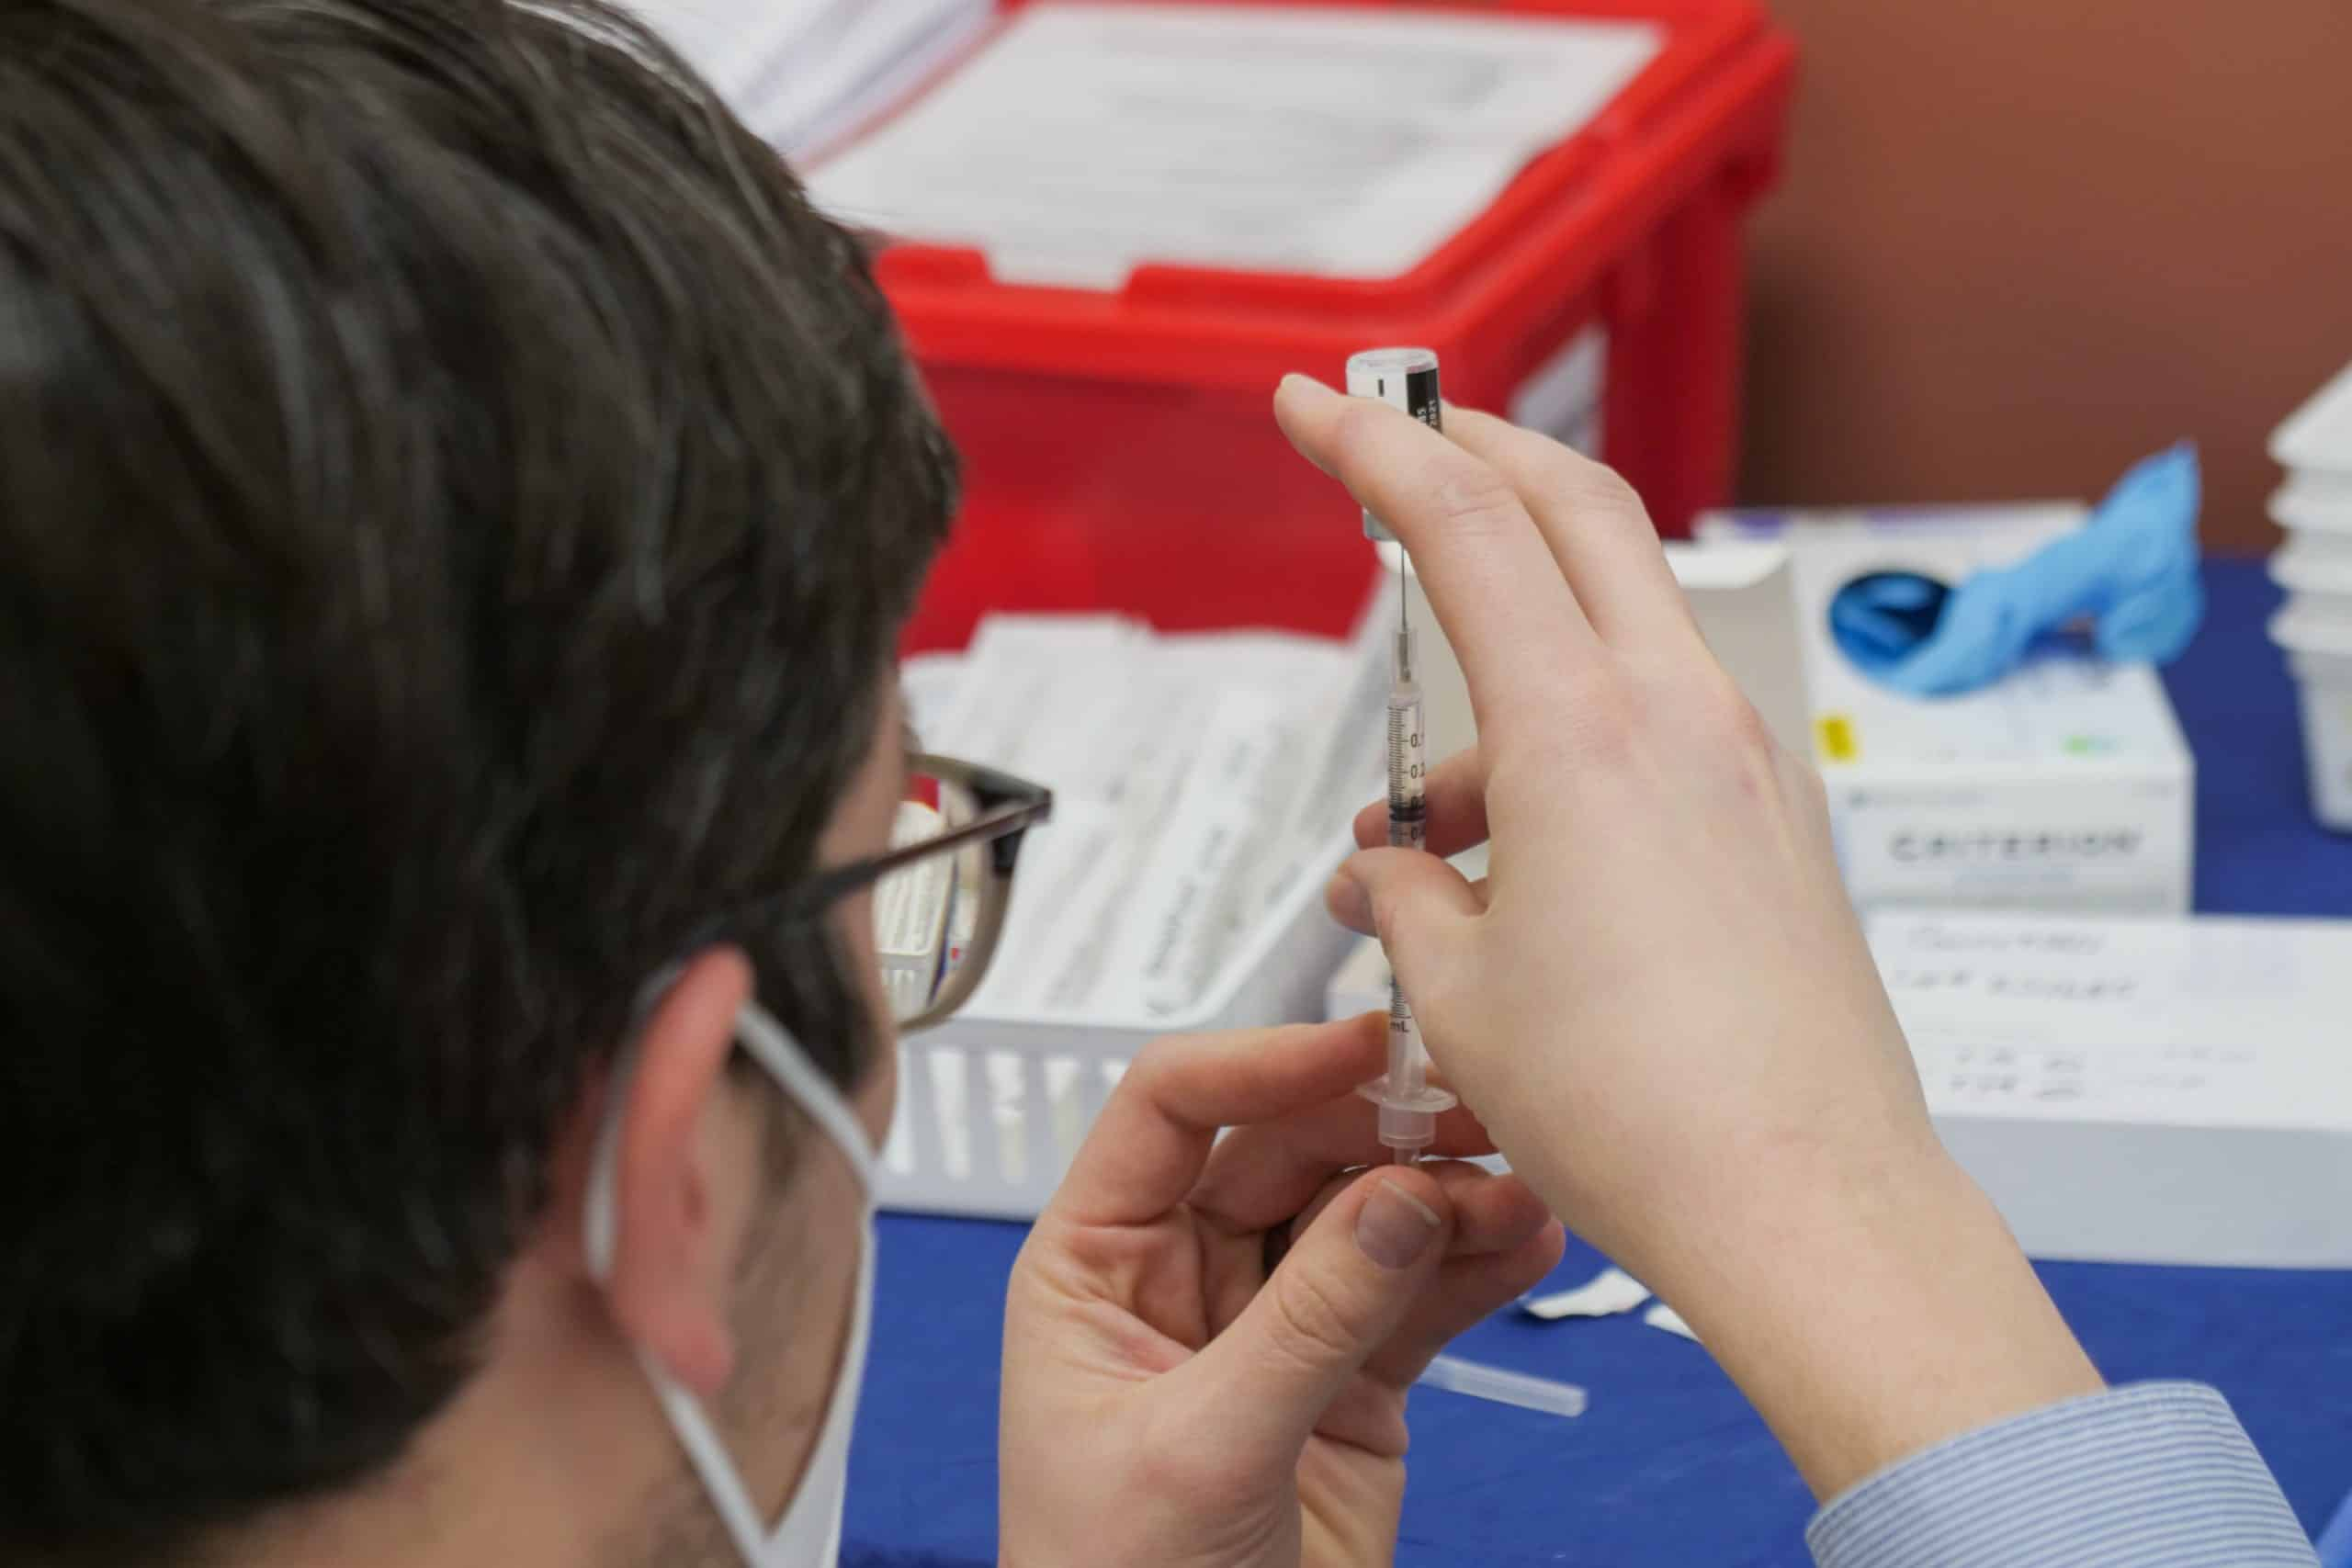 Vaccine being prepared